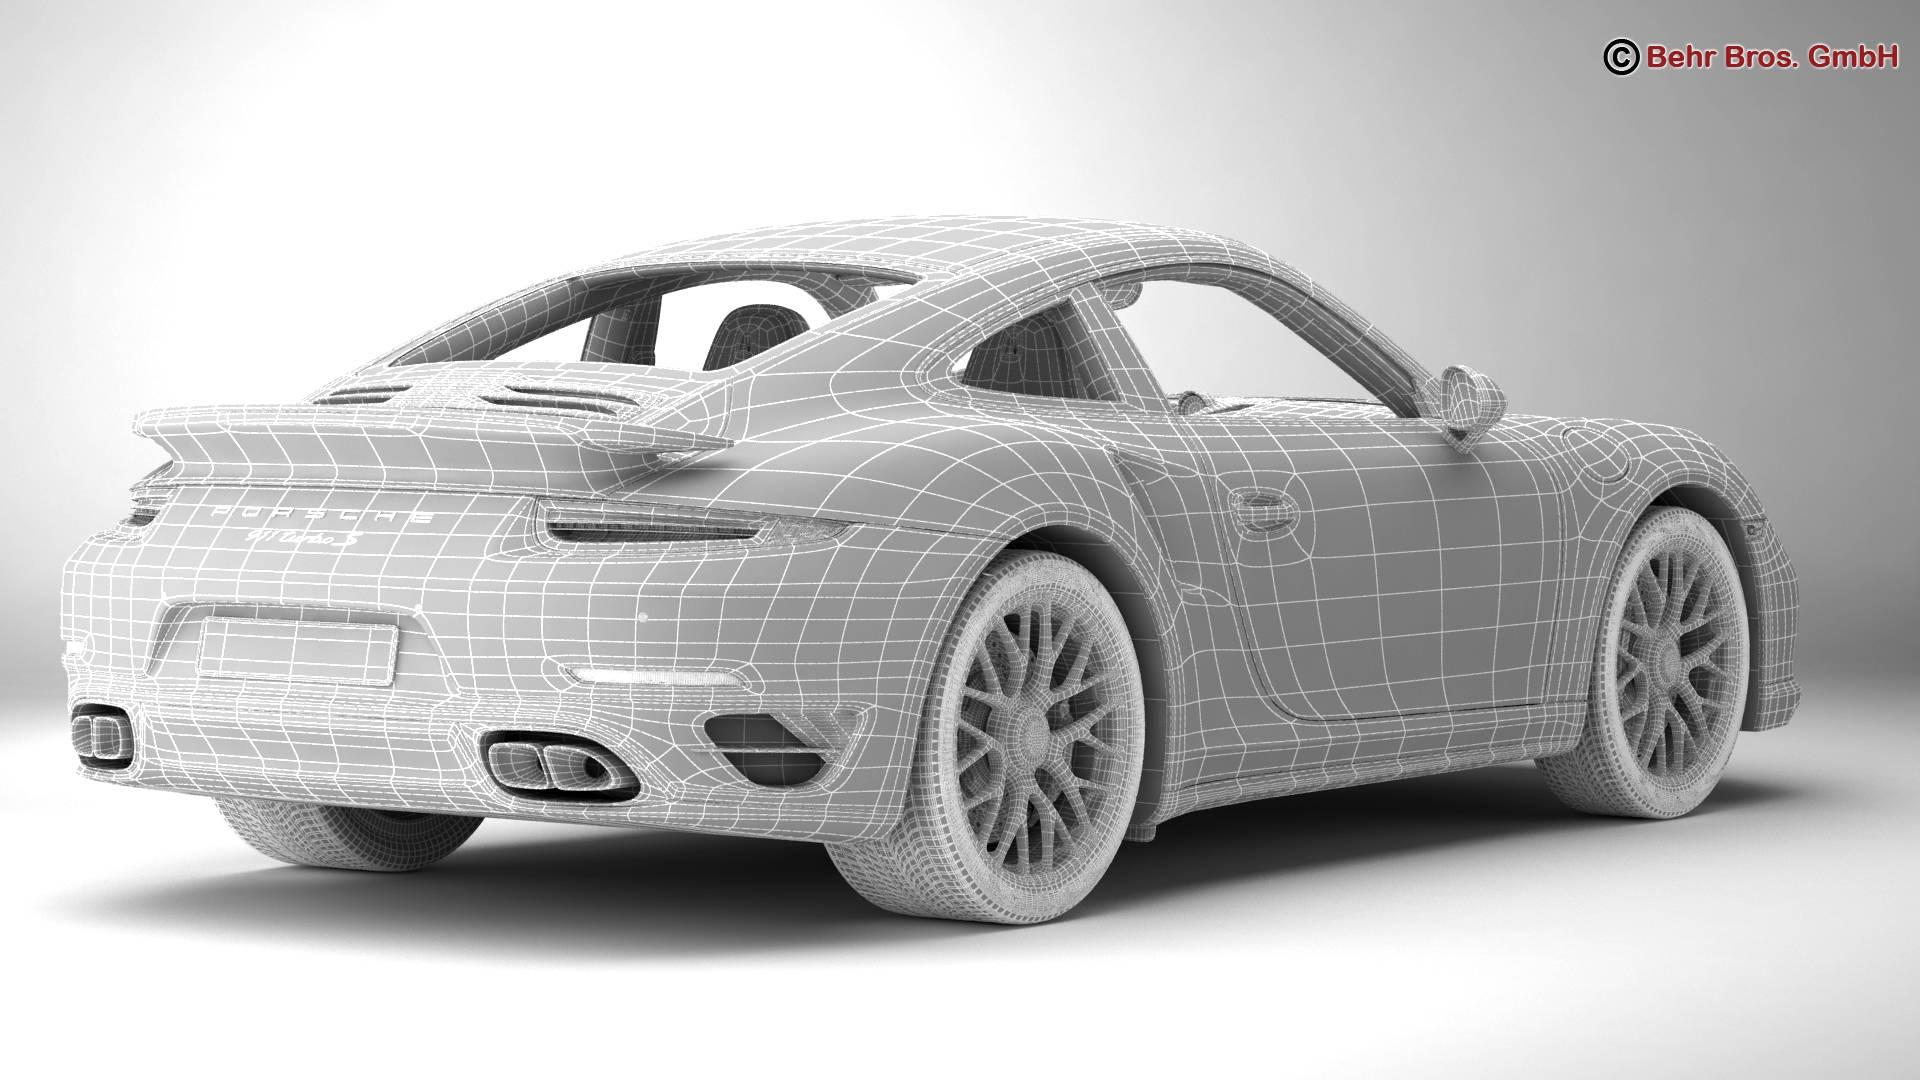 porsche 911 turbo s 2014 3d model 3ds max fbx c4d lwo ma mb obj 212493